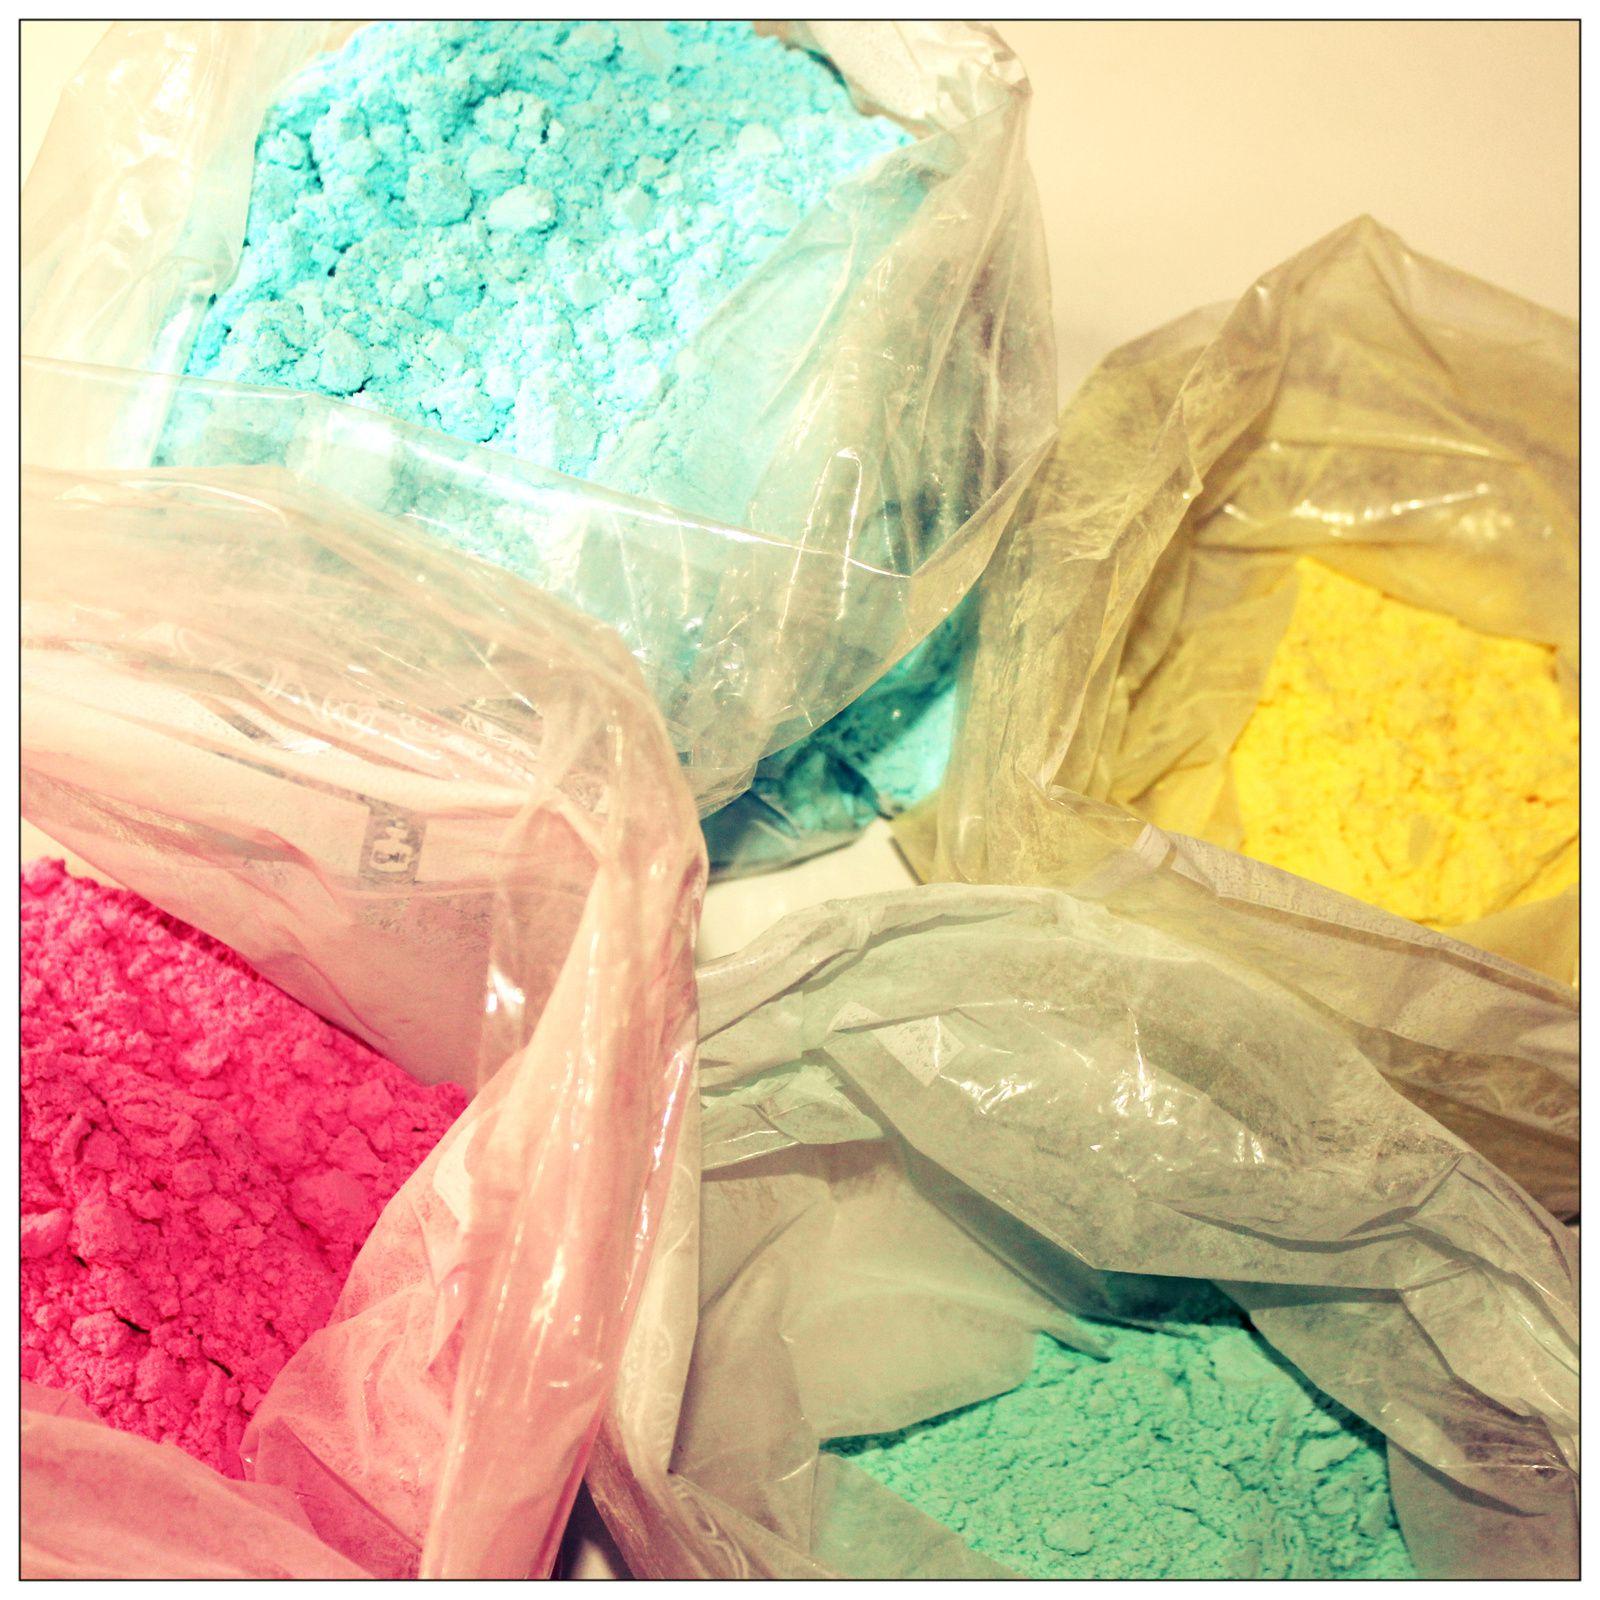 http://luniversdegarfield59.over-blog.com poudre holi fée maïzena colorante colorée